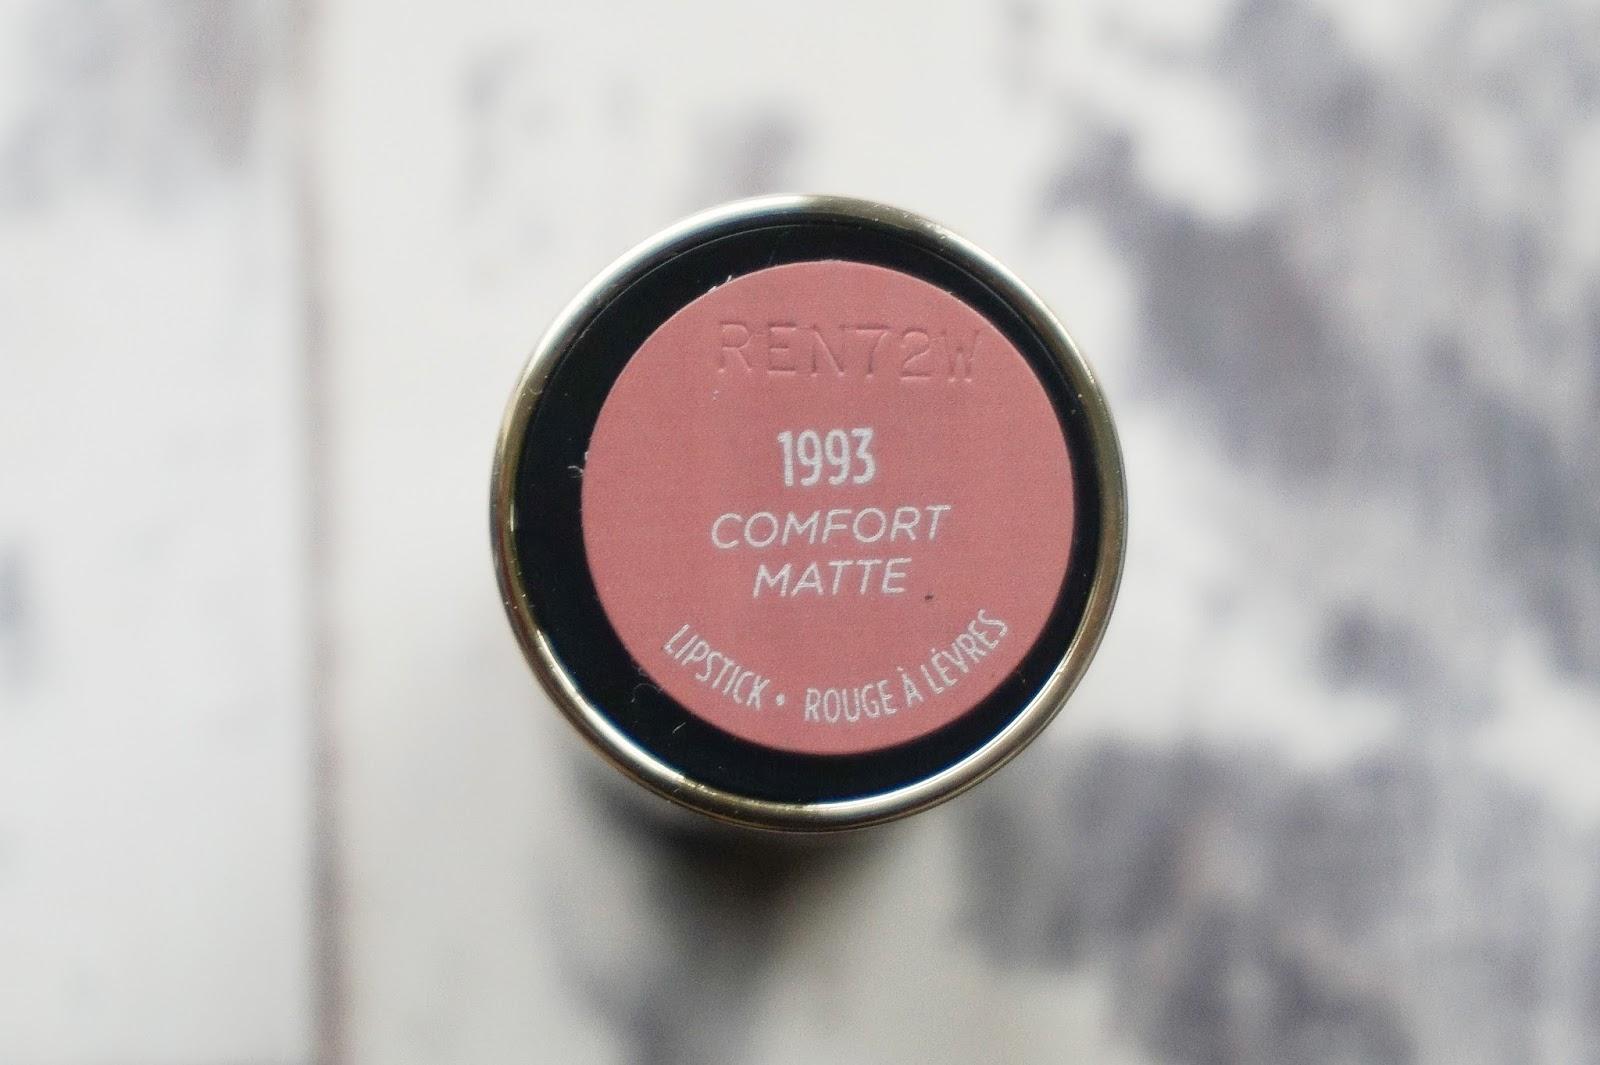 Urban Decay 1993 Dark Skin Black Skin Brown Skin Review Swatch Liquid Lipstick Comfort Matte Urban Decay Cosmetics Lipstick UK Blog Discoveries Of Self Natalie Kayo